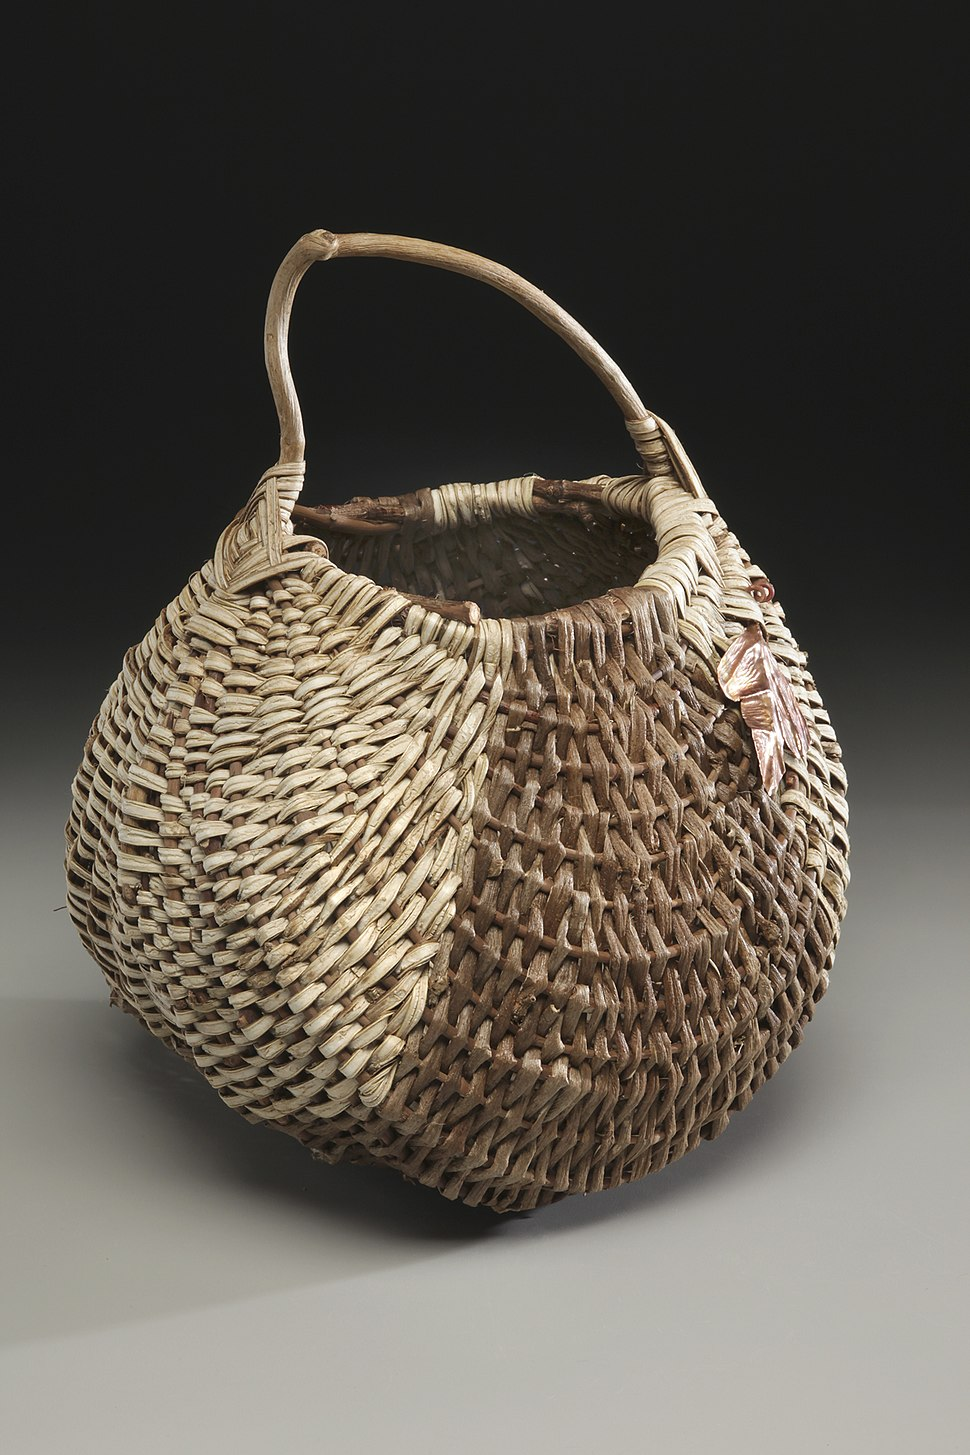 Handmade basket kudzu